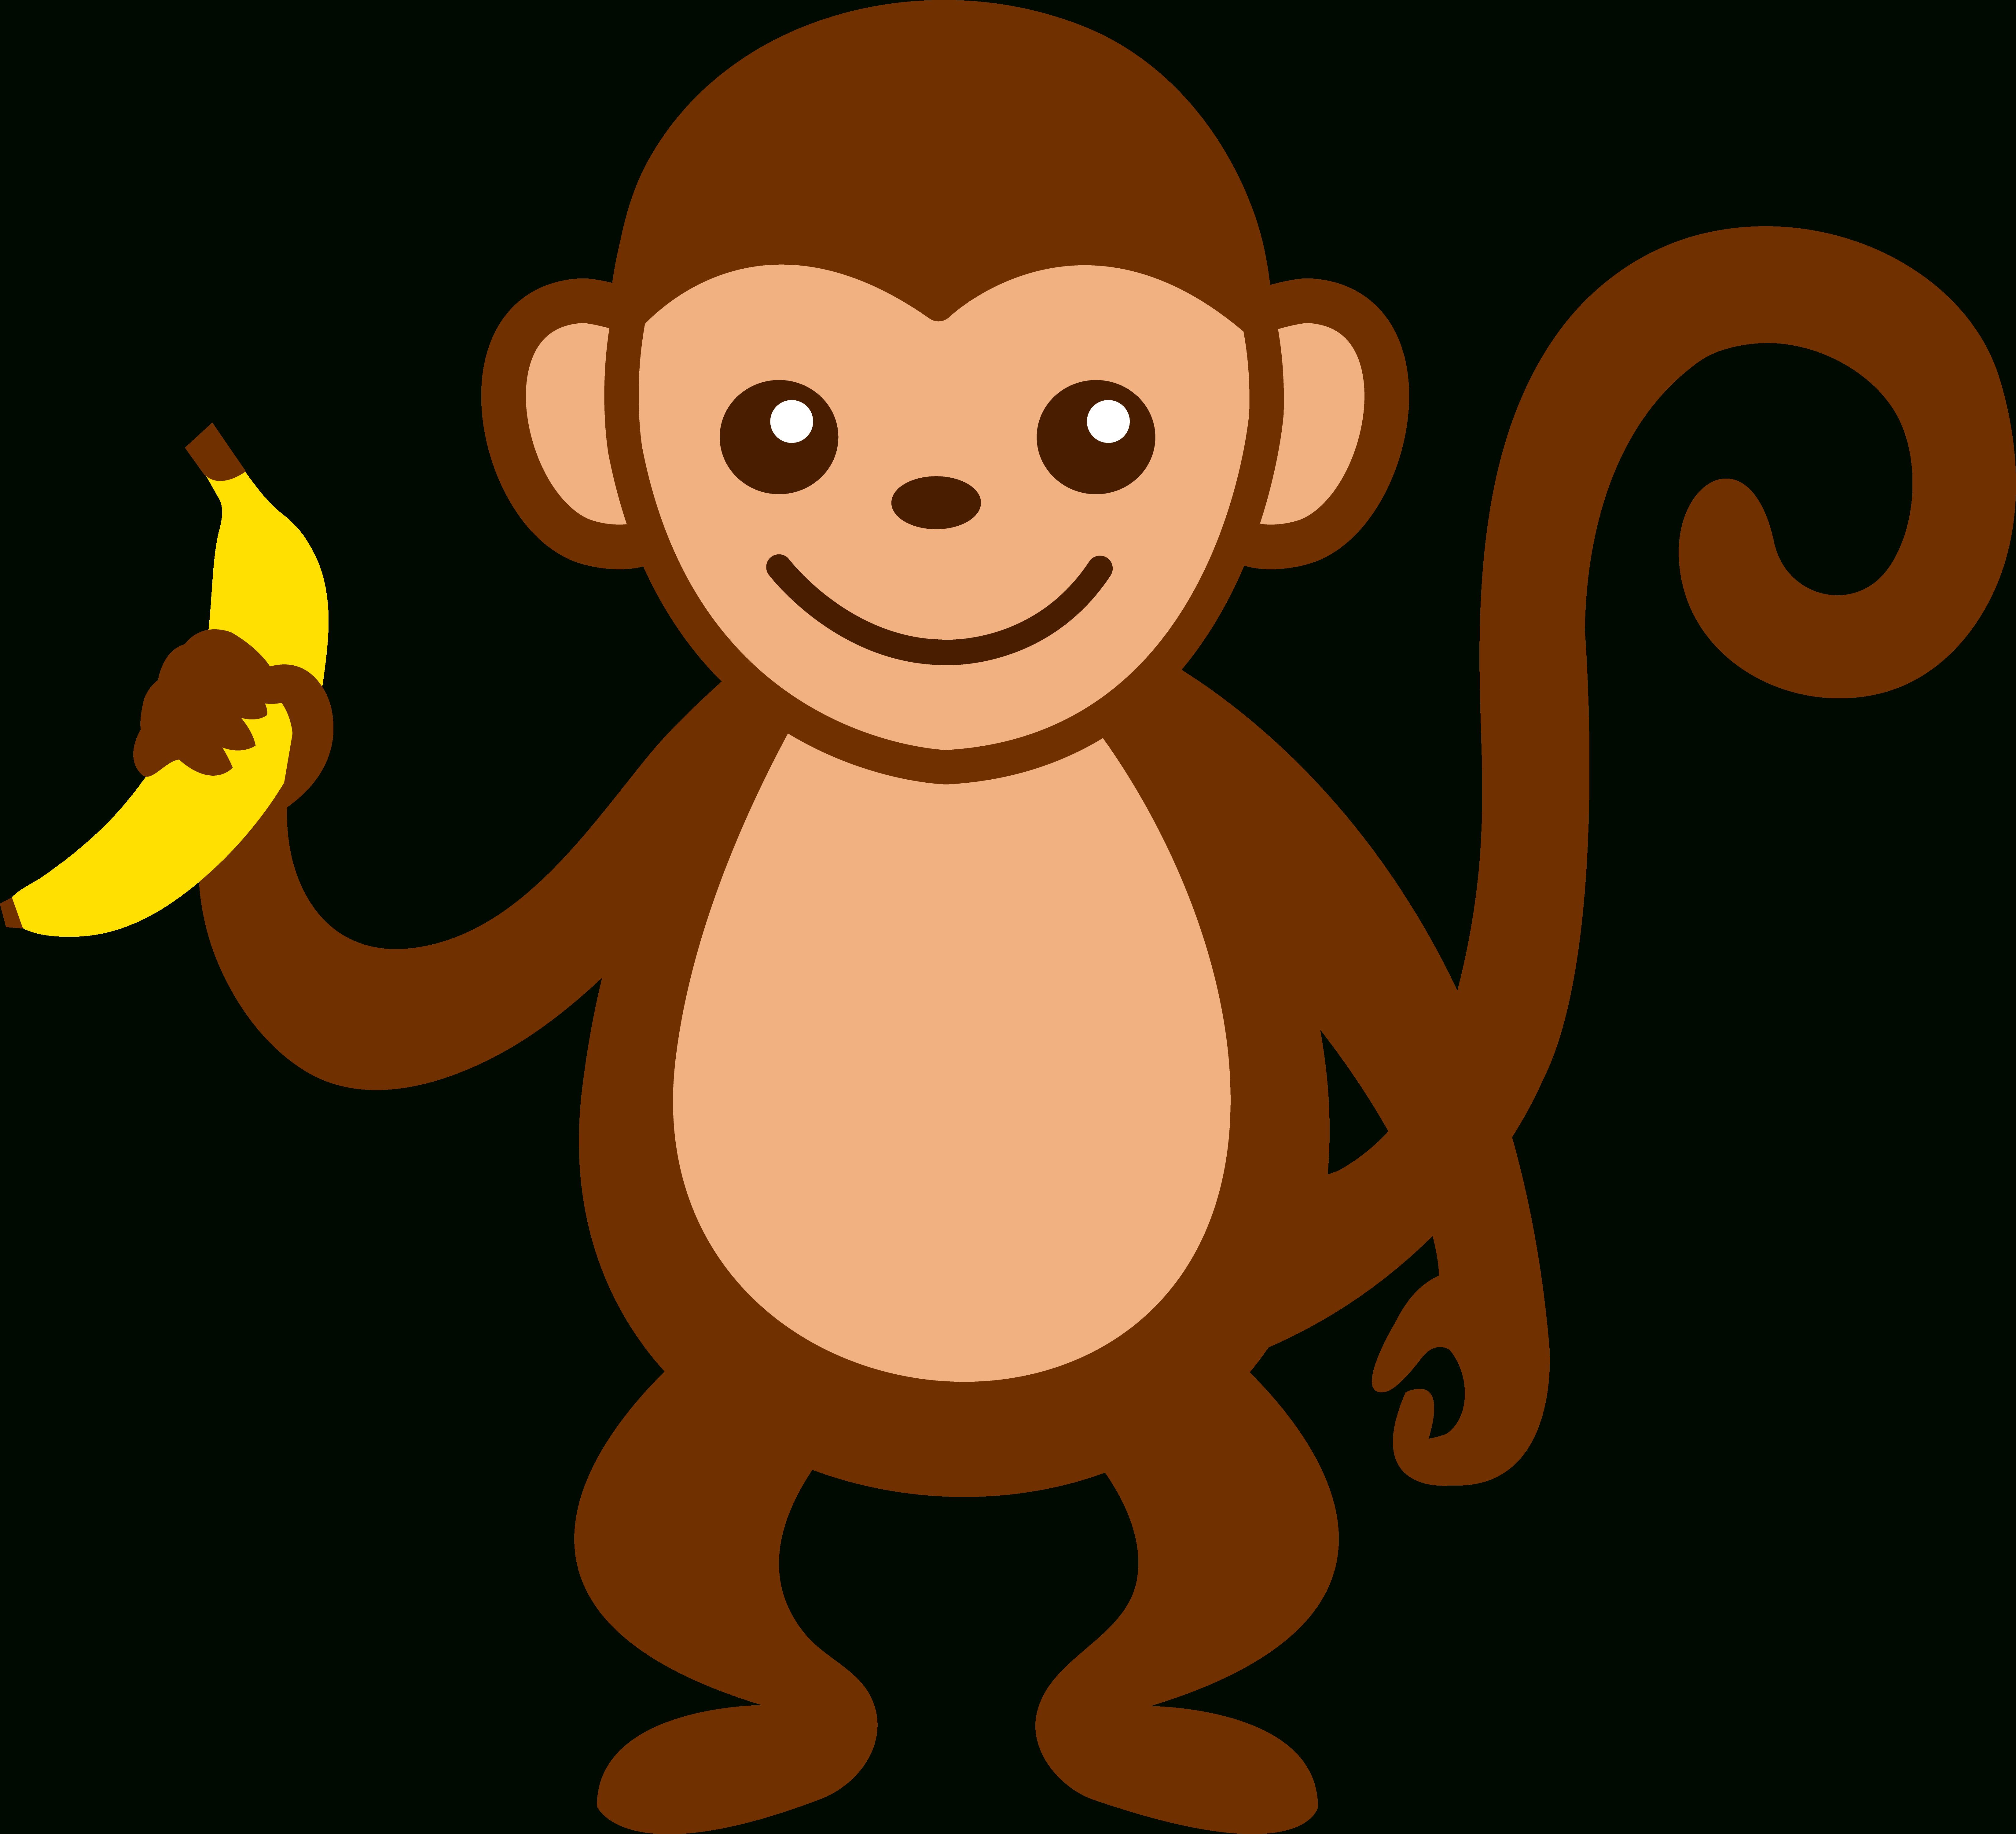 Free Monkey Images, Download Free Clip Art, Free Clip Art On Clipart - Free Printable Sock Monkey Clip Art